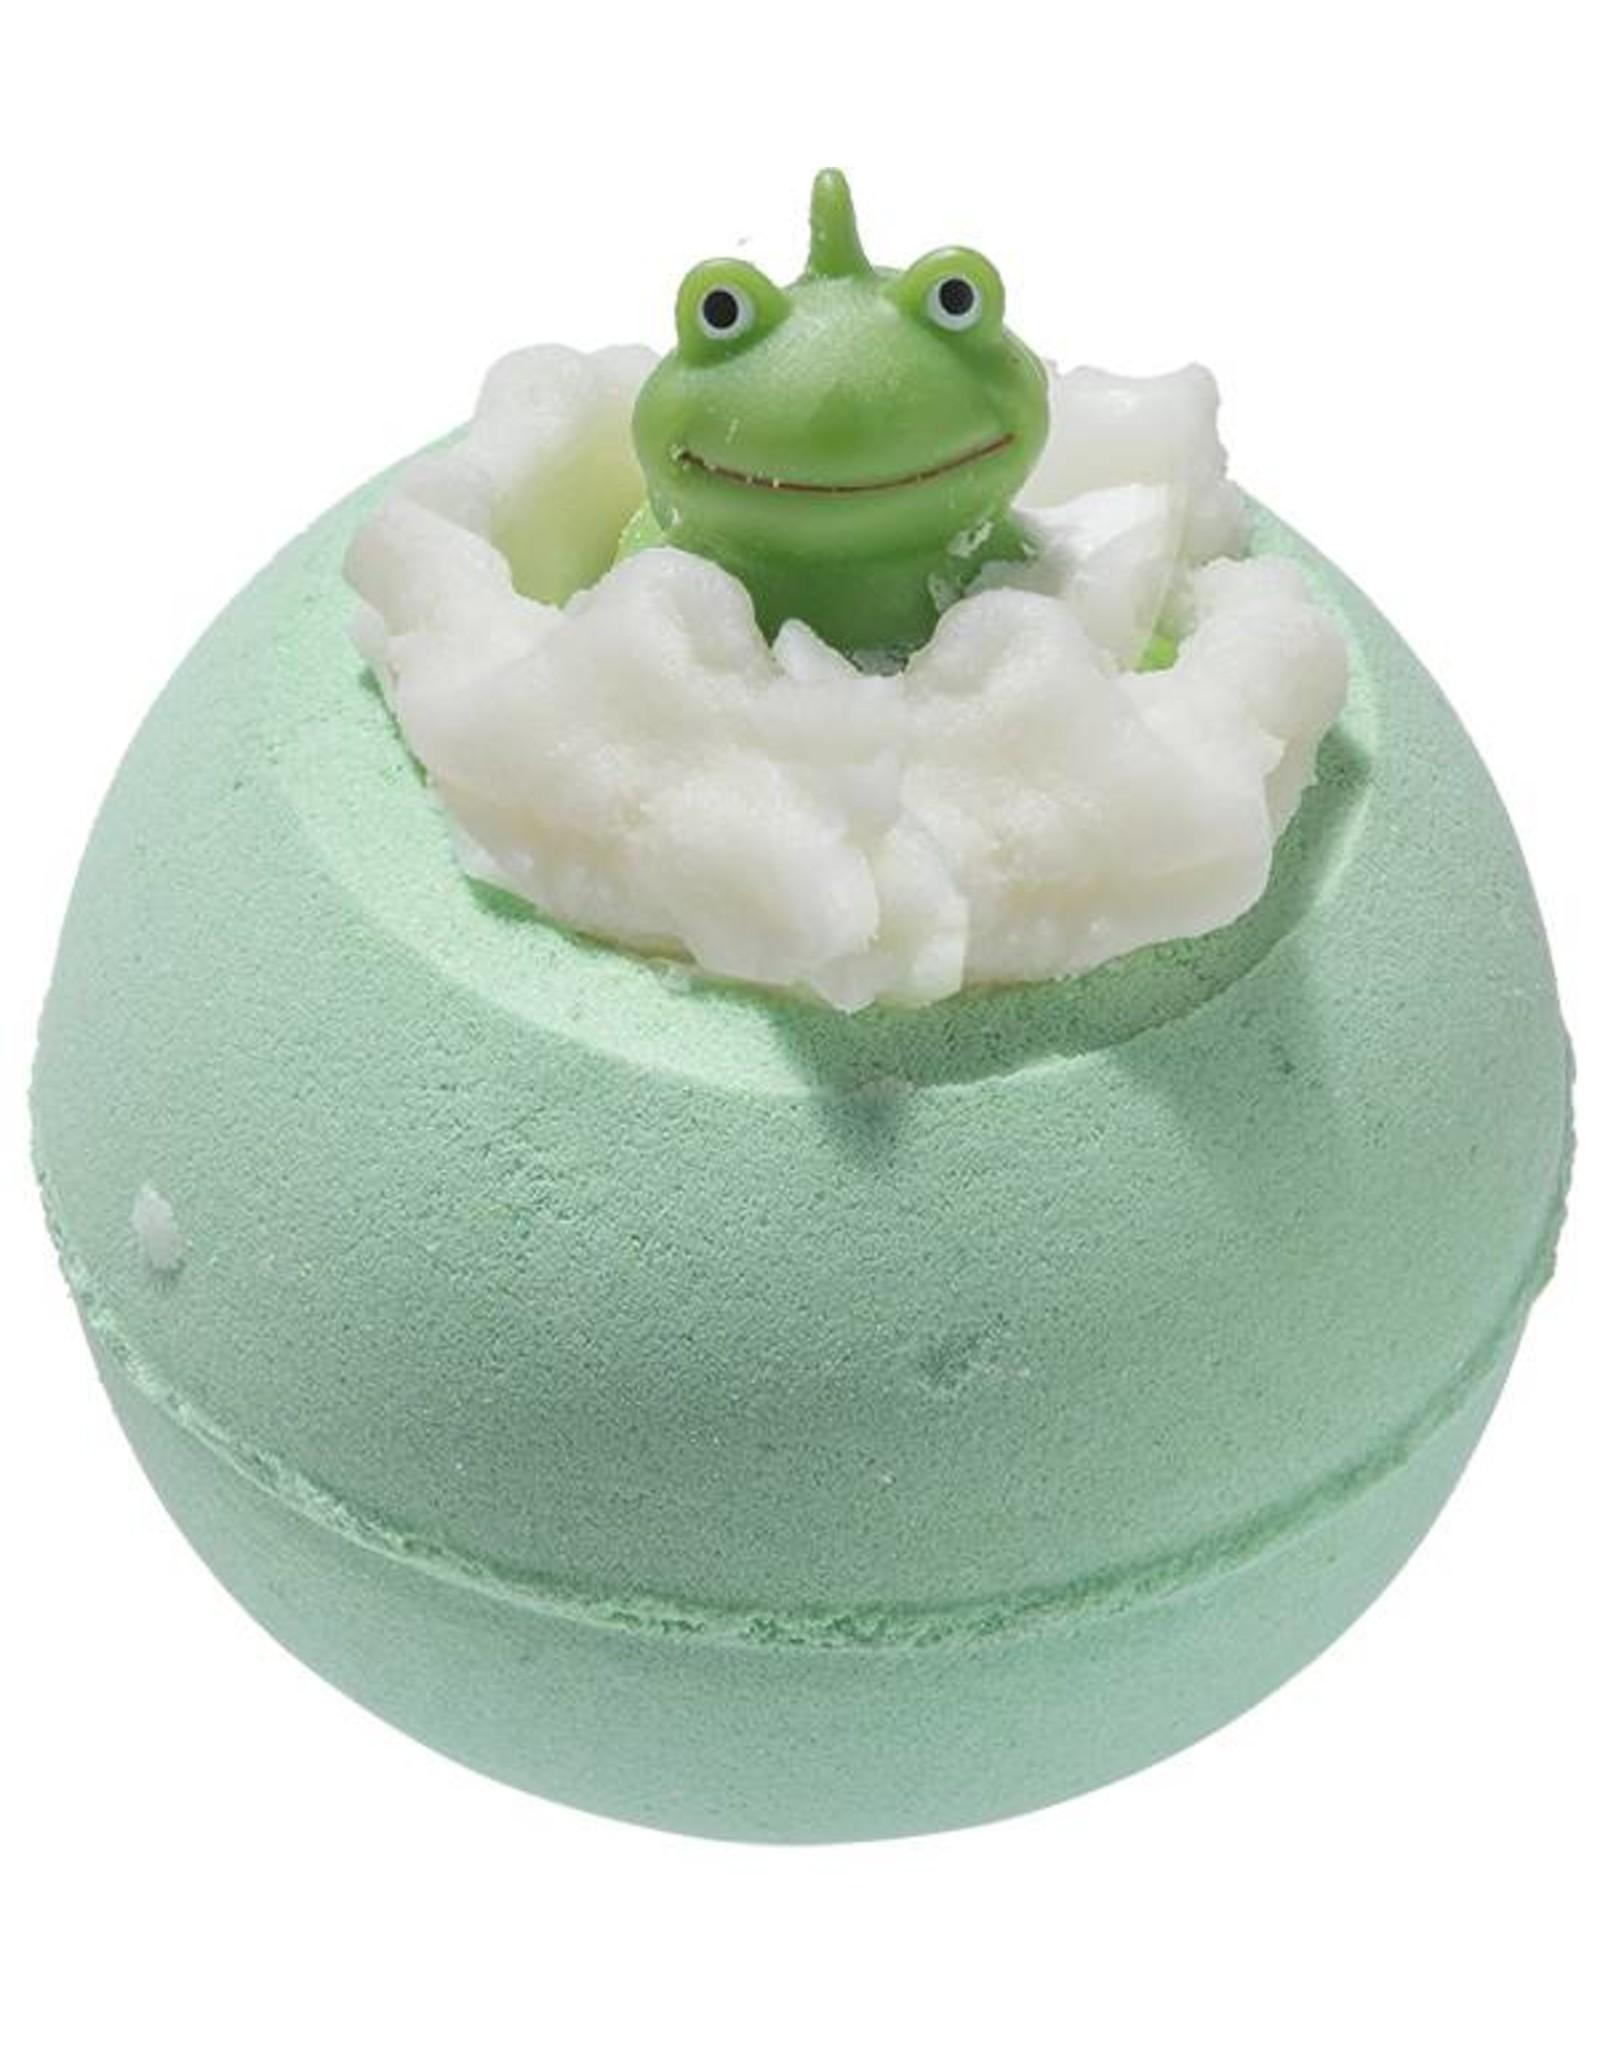 Bomb Cosmetics Bath Blaster 'It's Not Easy Being Green' - Body & Soap